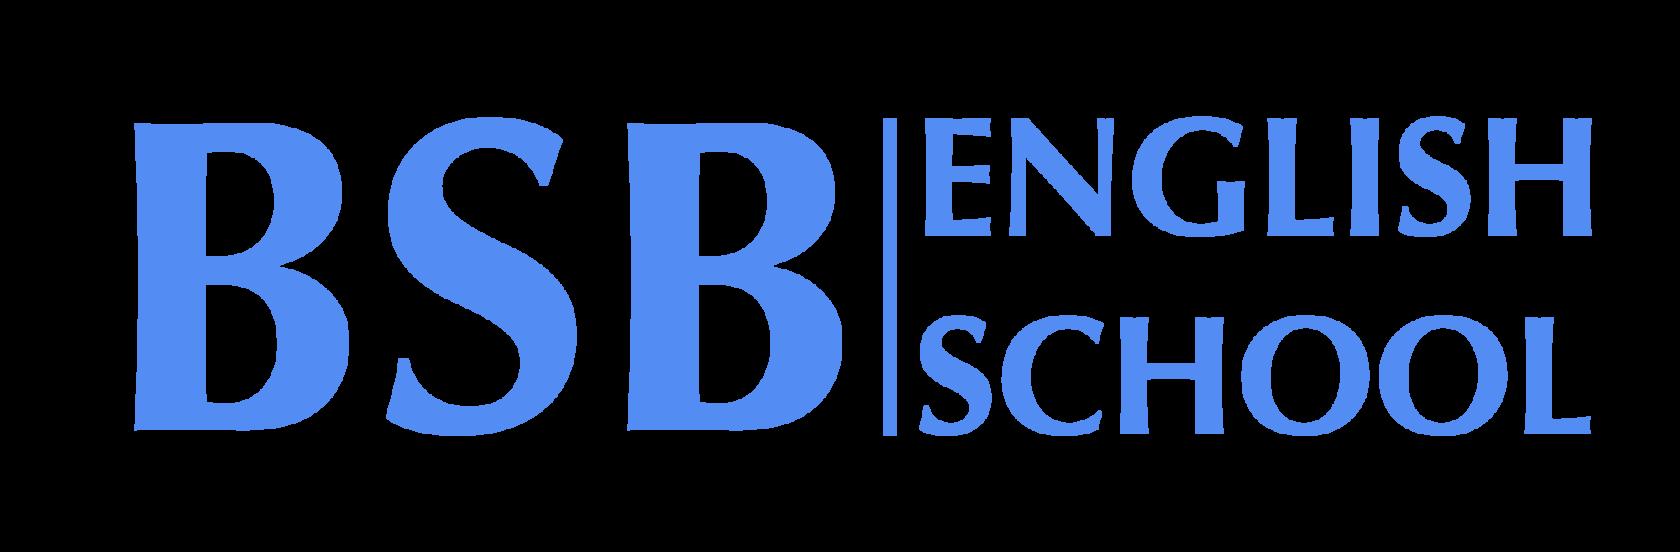 BSB English School